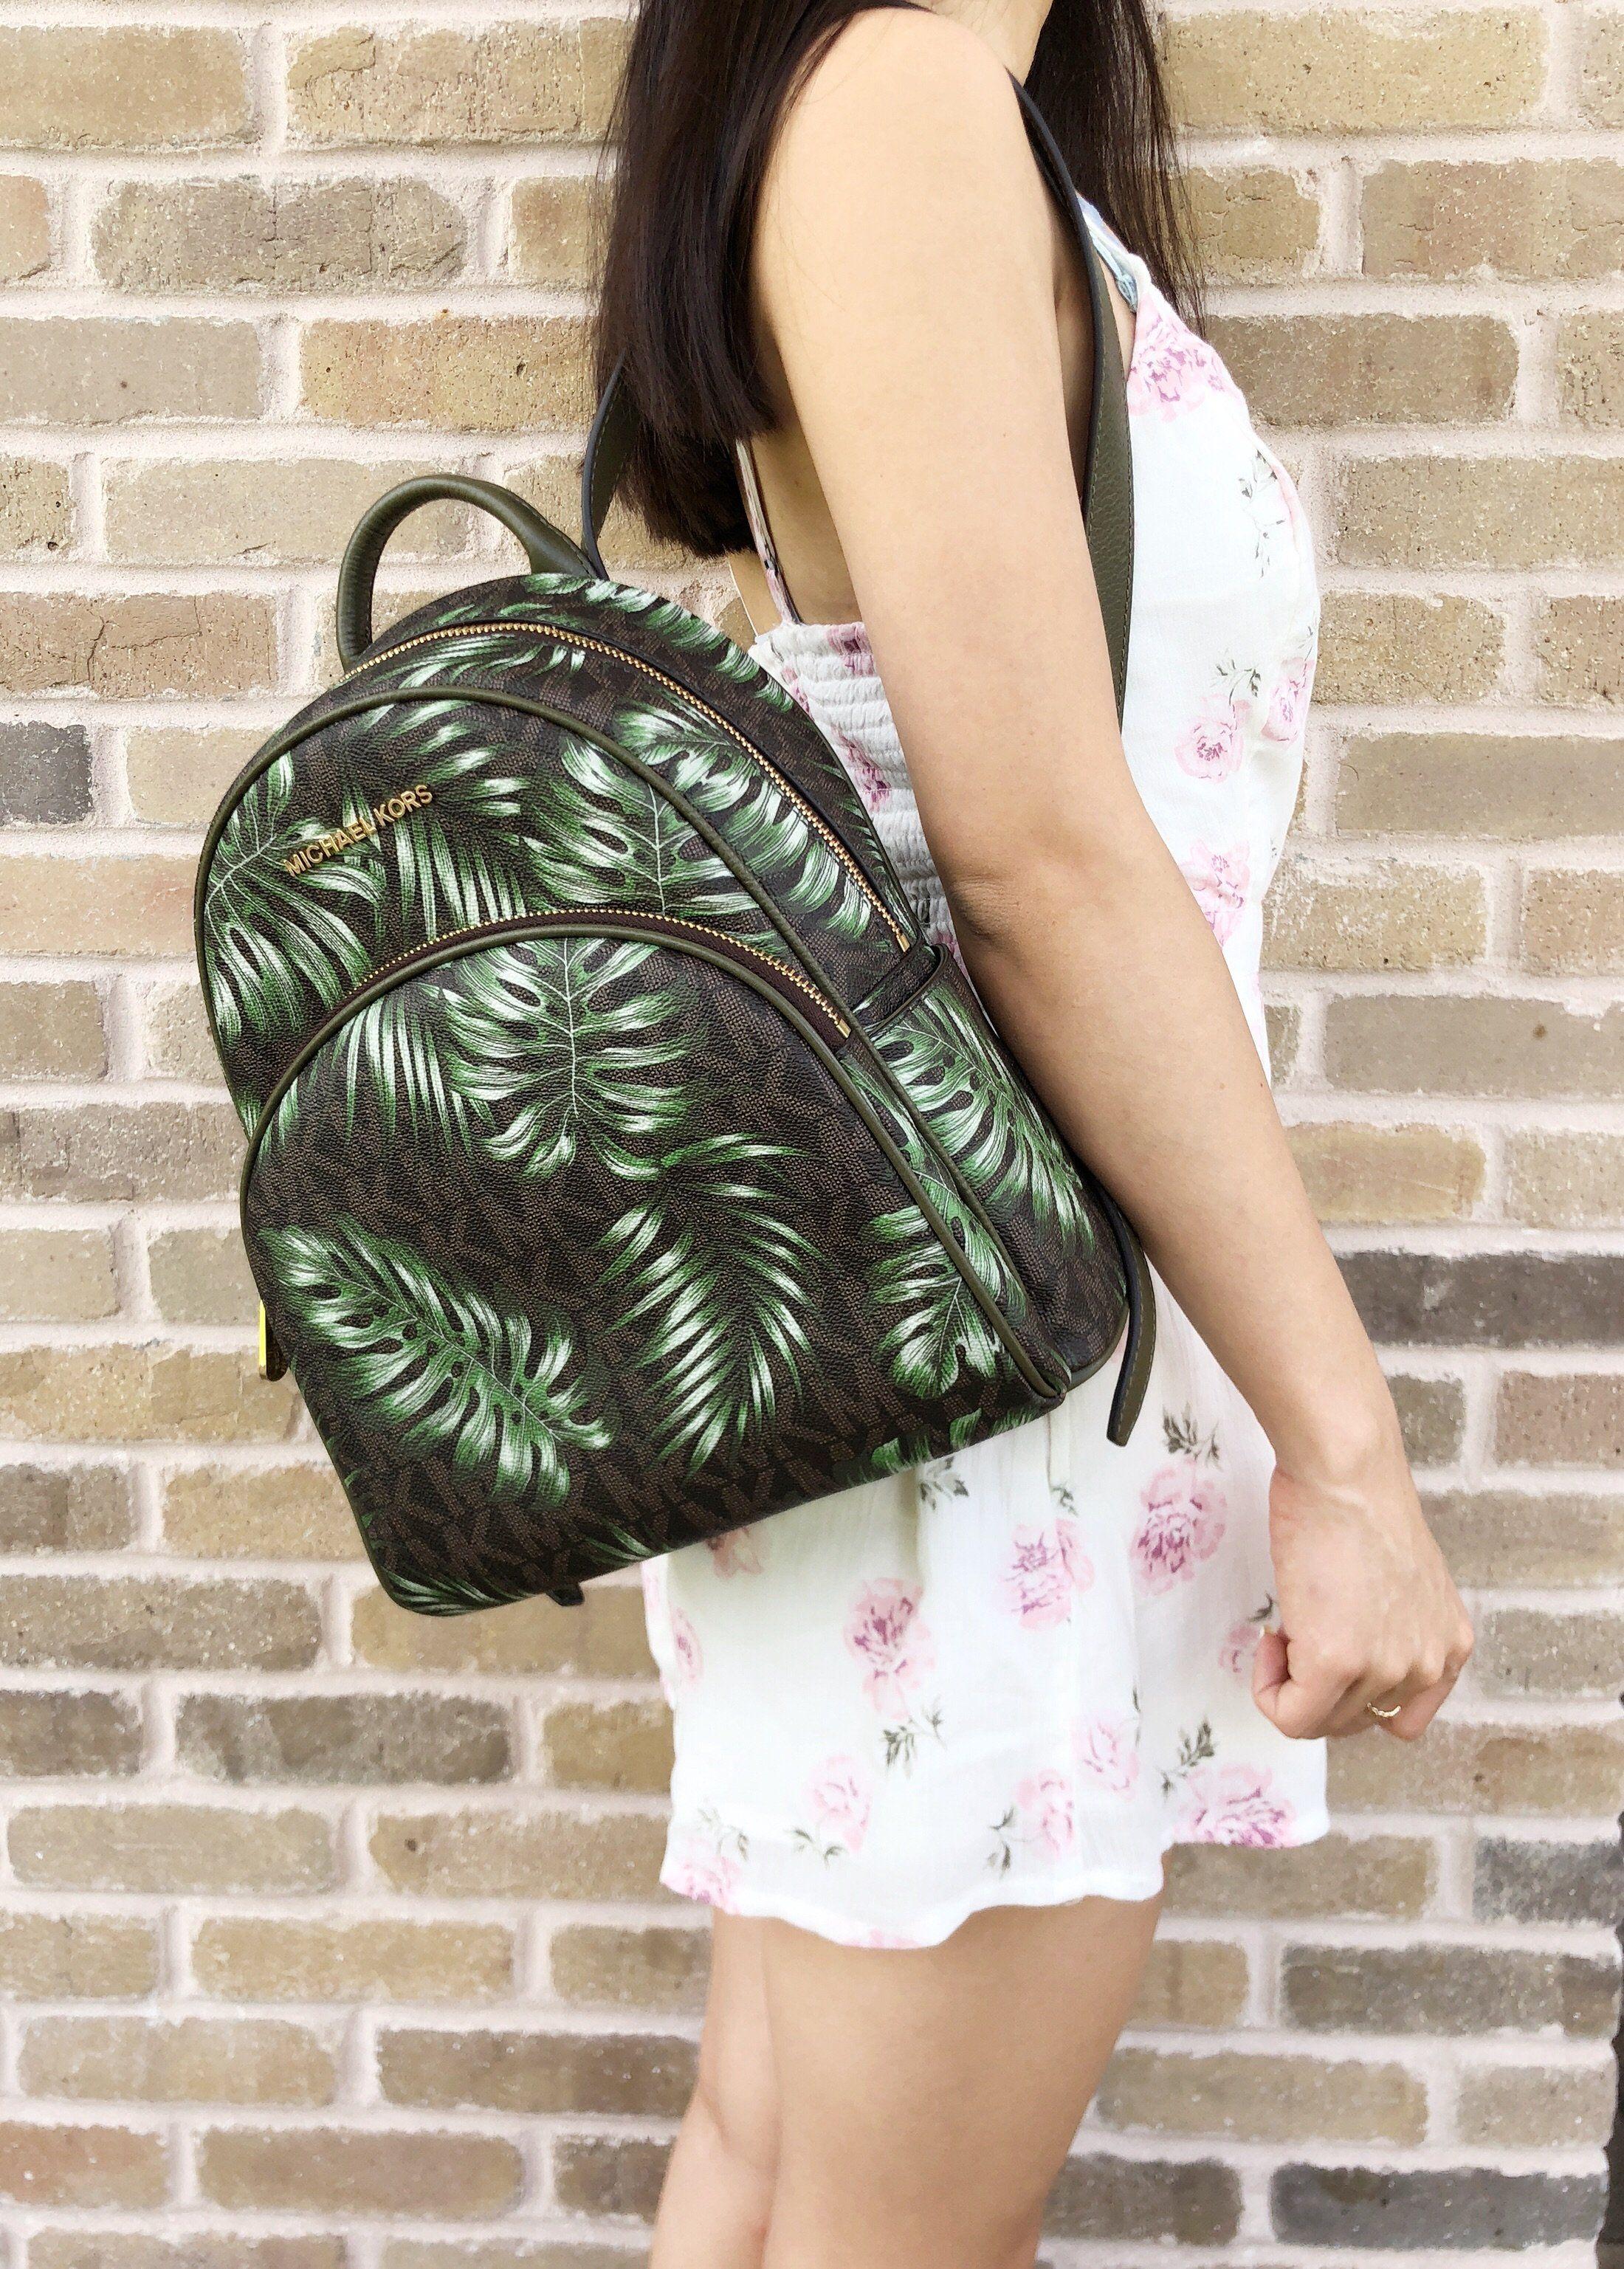 d28cd9576cd6 Michael Kors Abbey Medium Backpack Brown MK Olive Green Palm Leaves #MK  #poshcloset #michaelkorsaria #poshboss #posh #tradesy #poshpackages ...